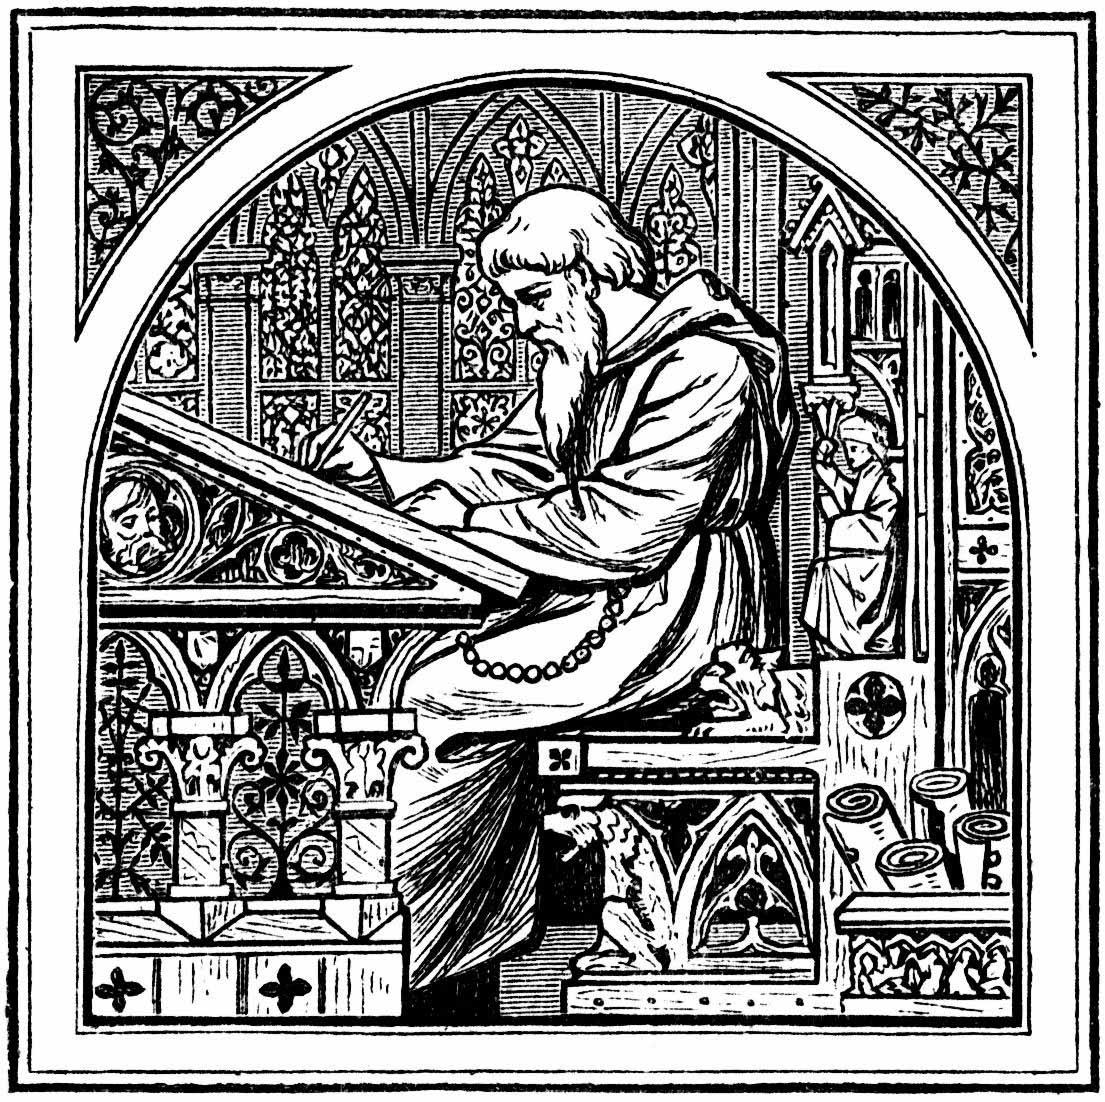 AxPx Guest Post: A Response to Dr. Bart D. Ehrman's Critique of the KJV Bible